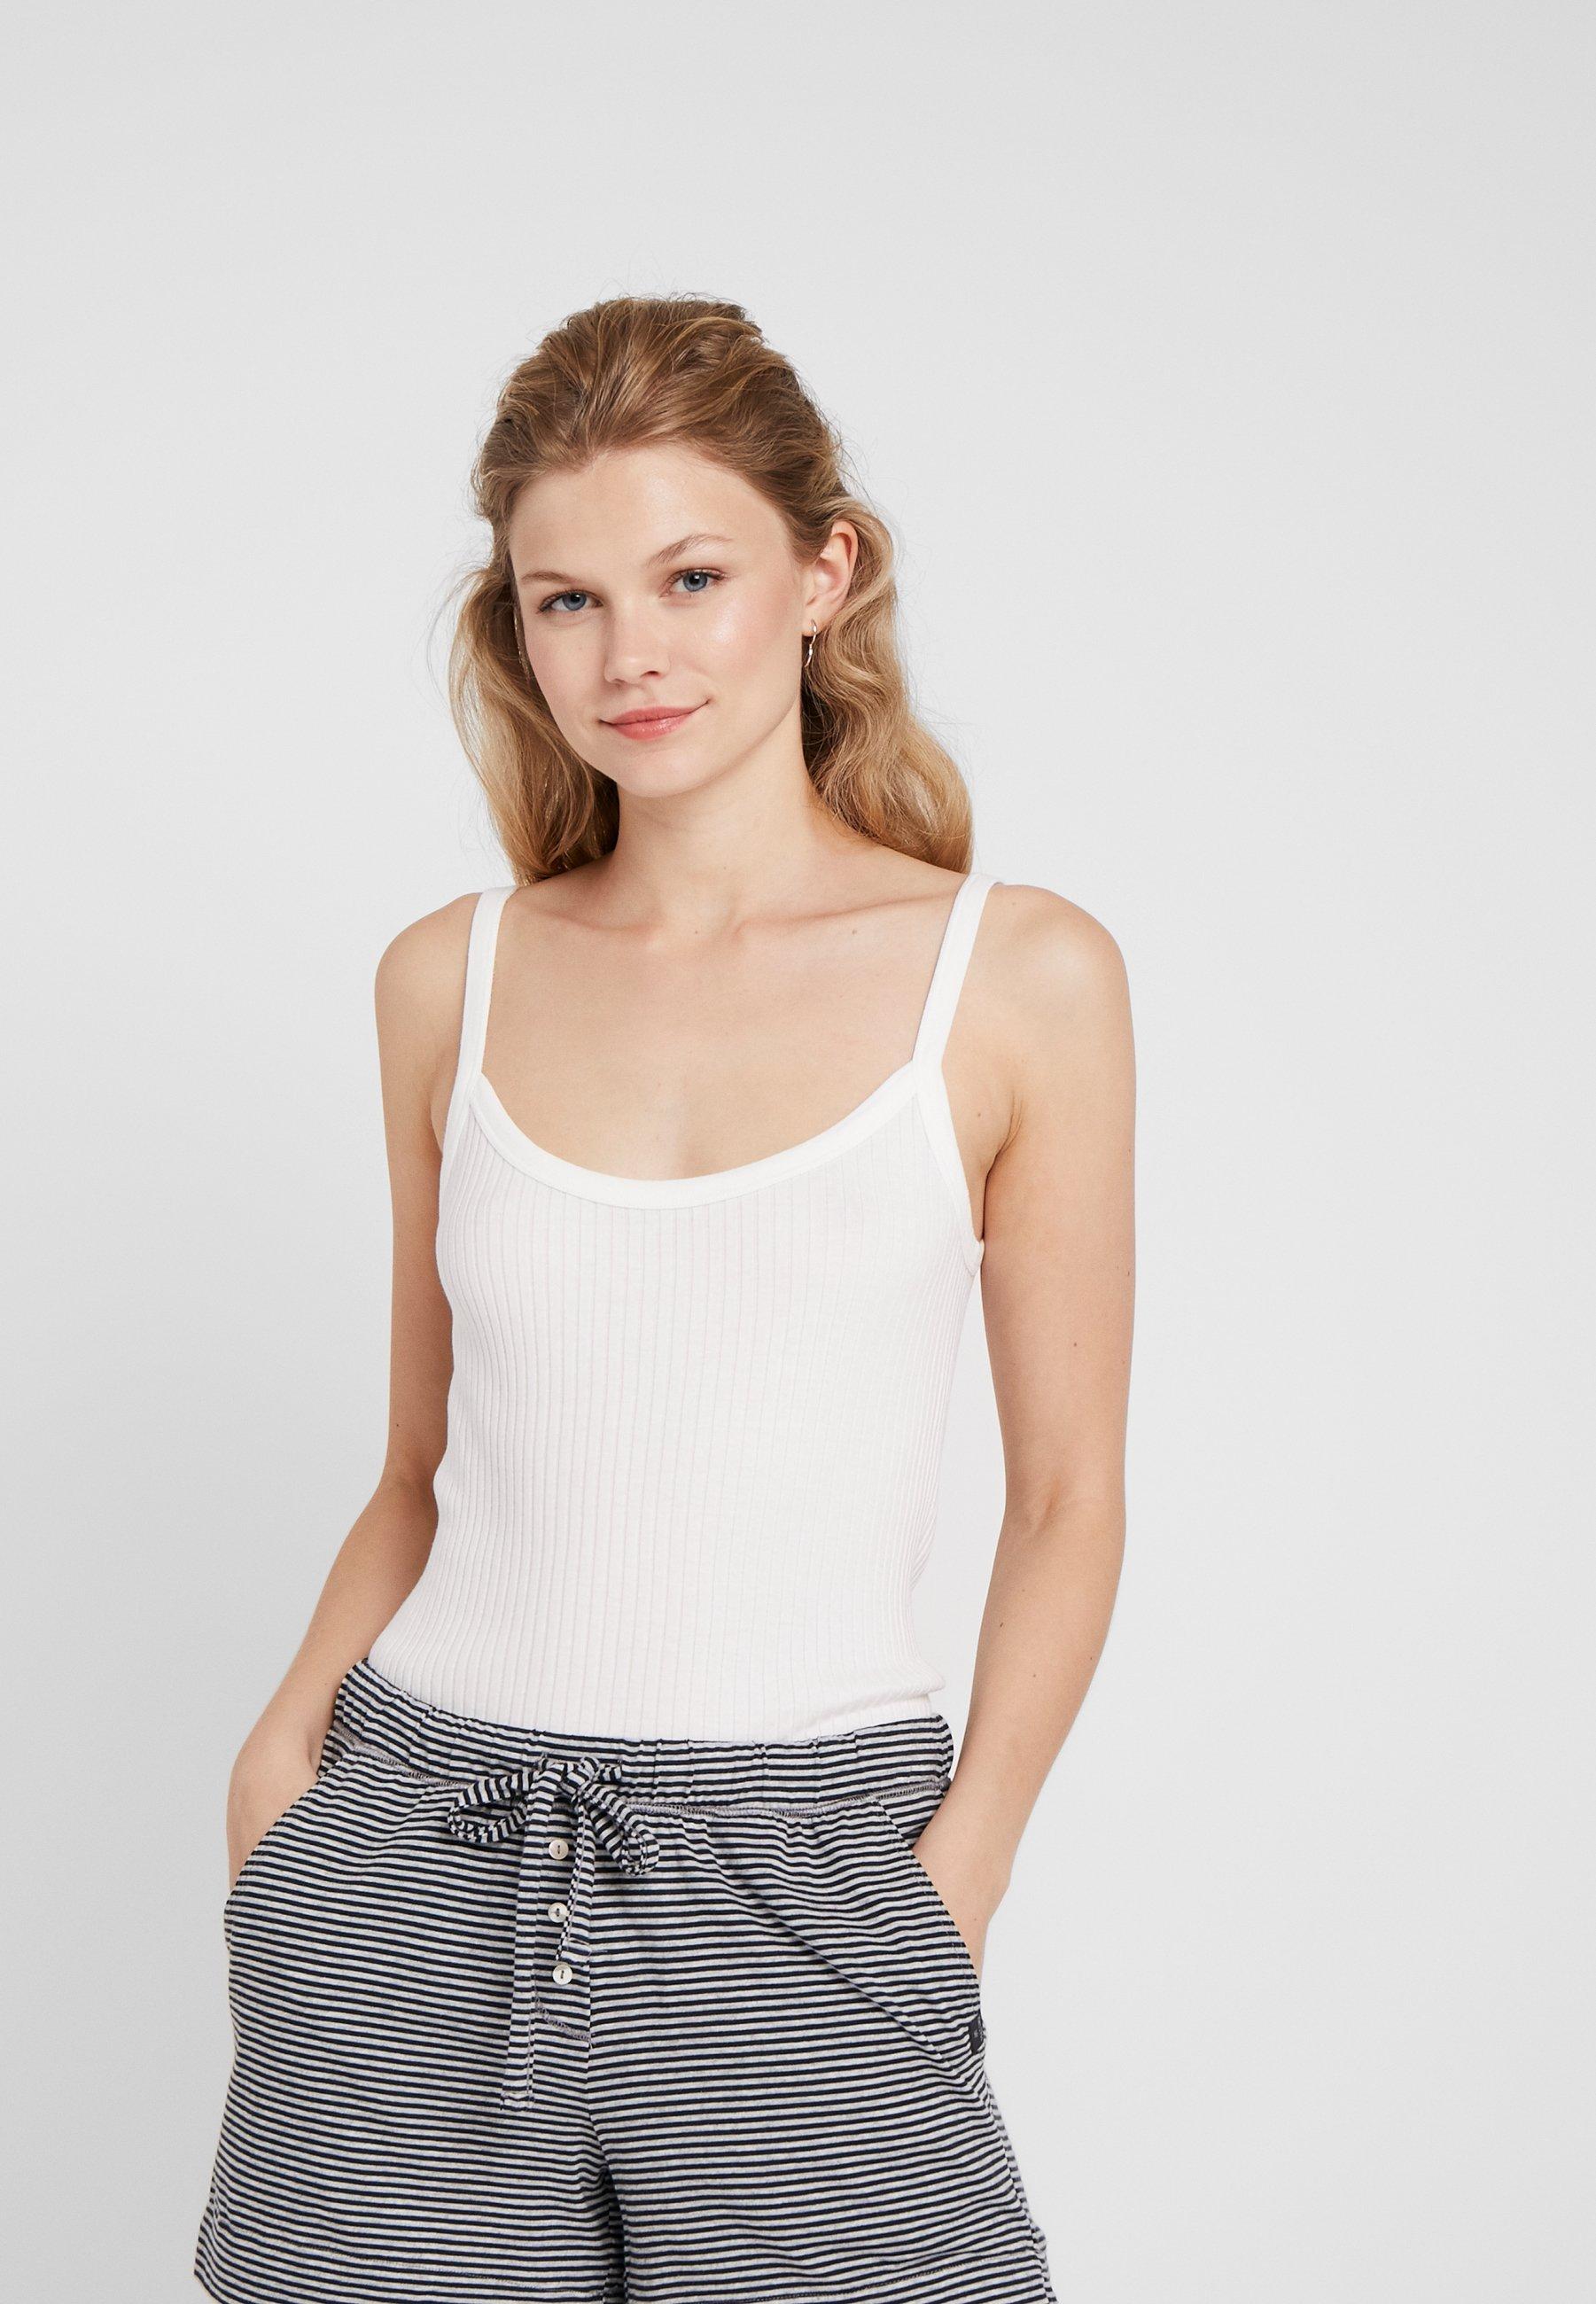 Damen SPAGHETTITRÄGER - Nachtwäsche Shirt